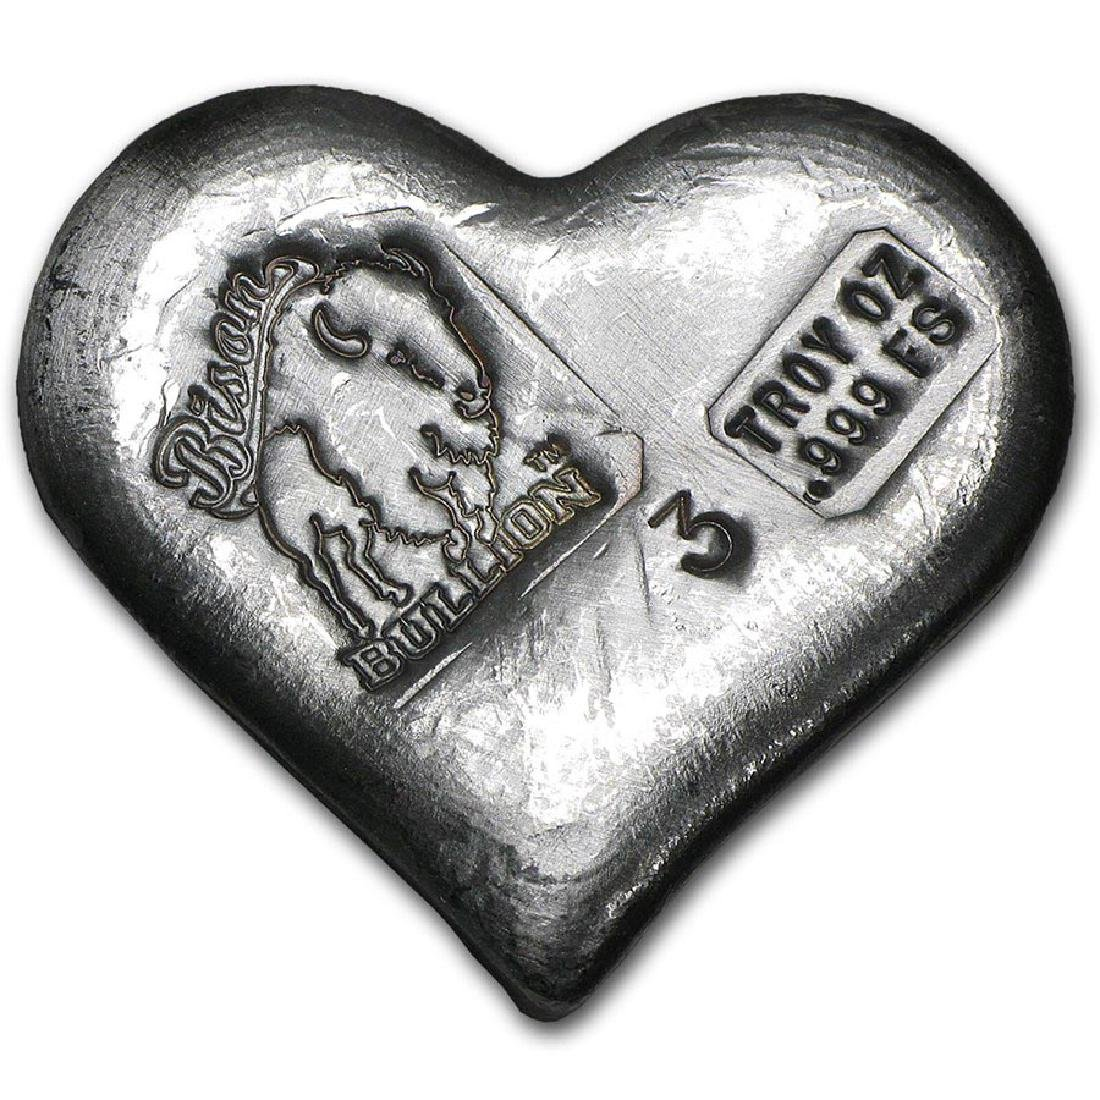 3 oz Silver Heart - Bison Bullion